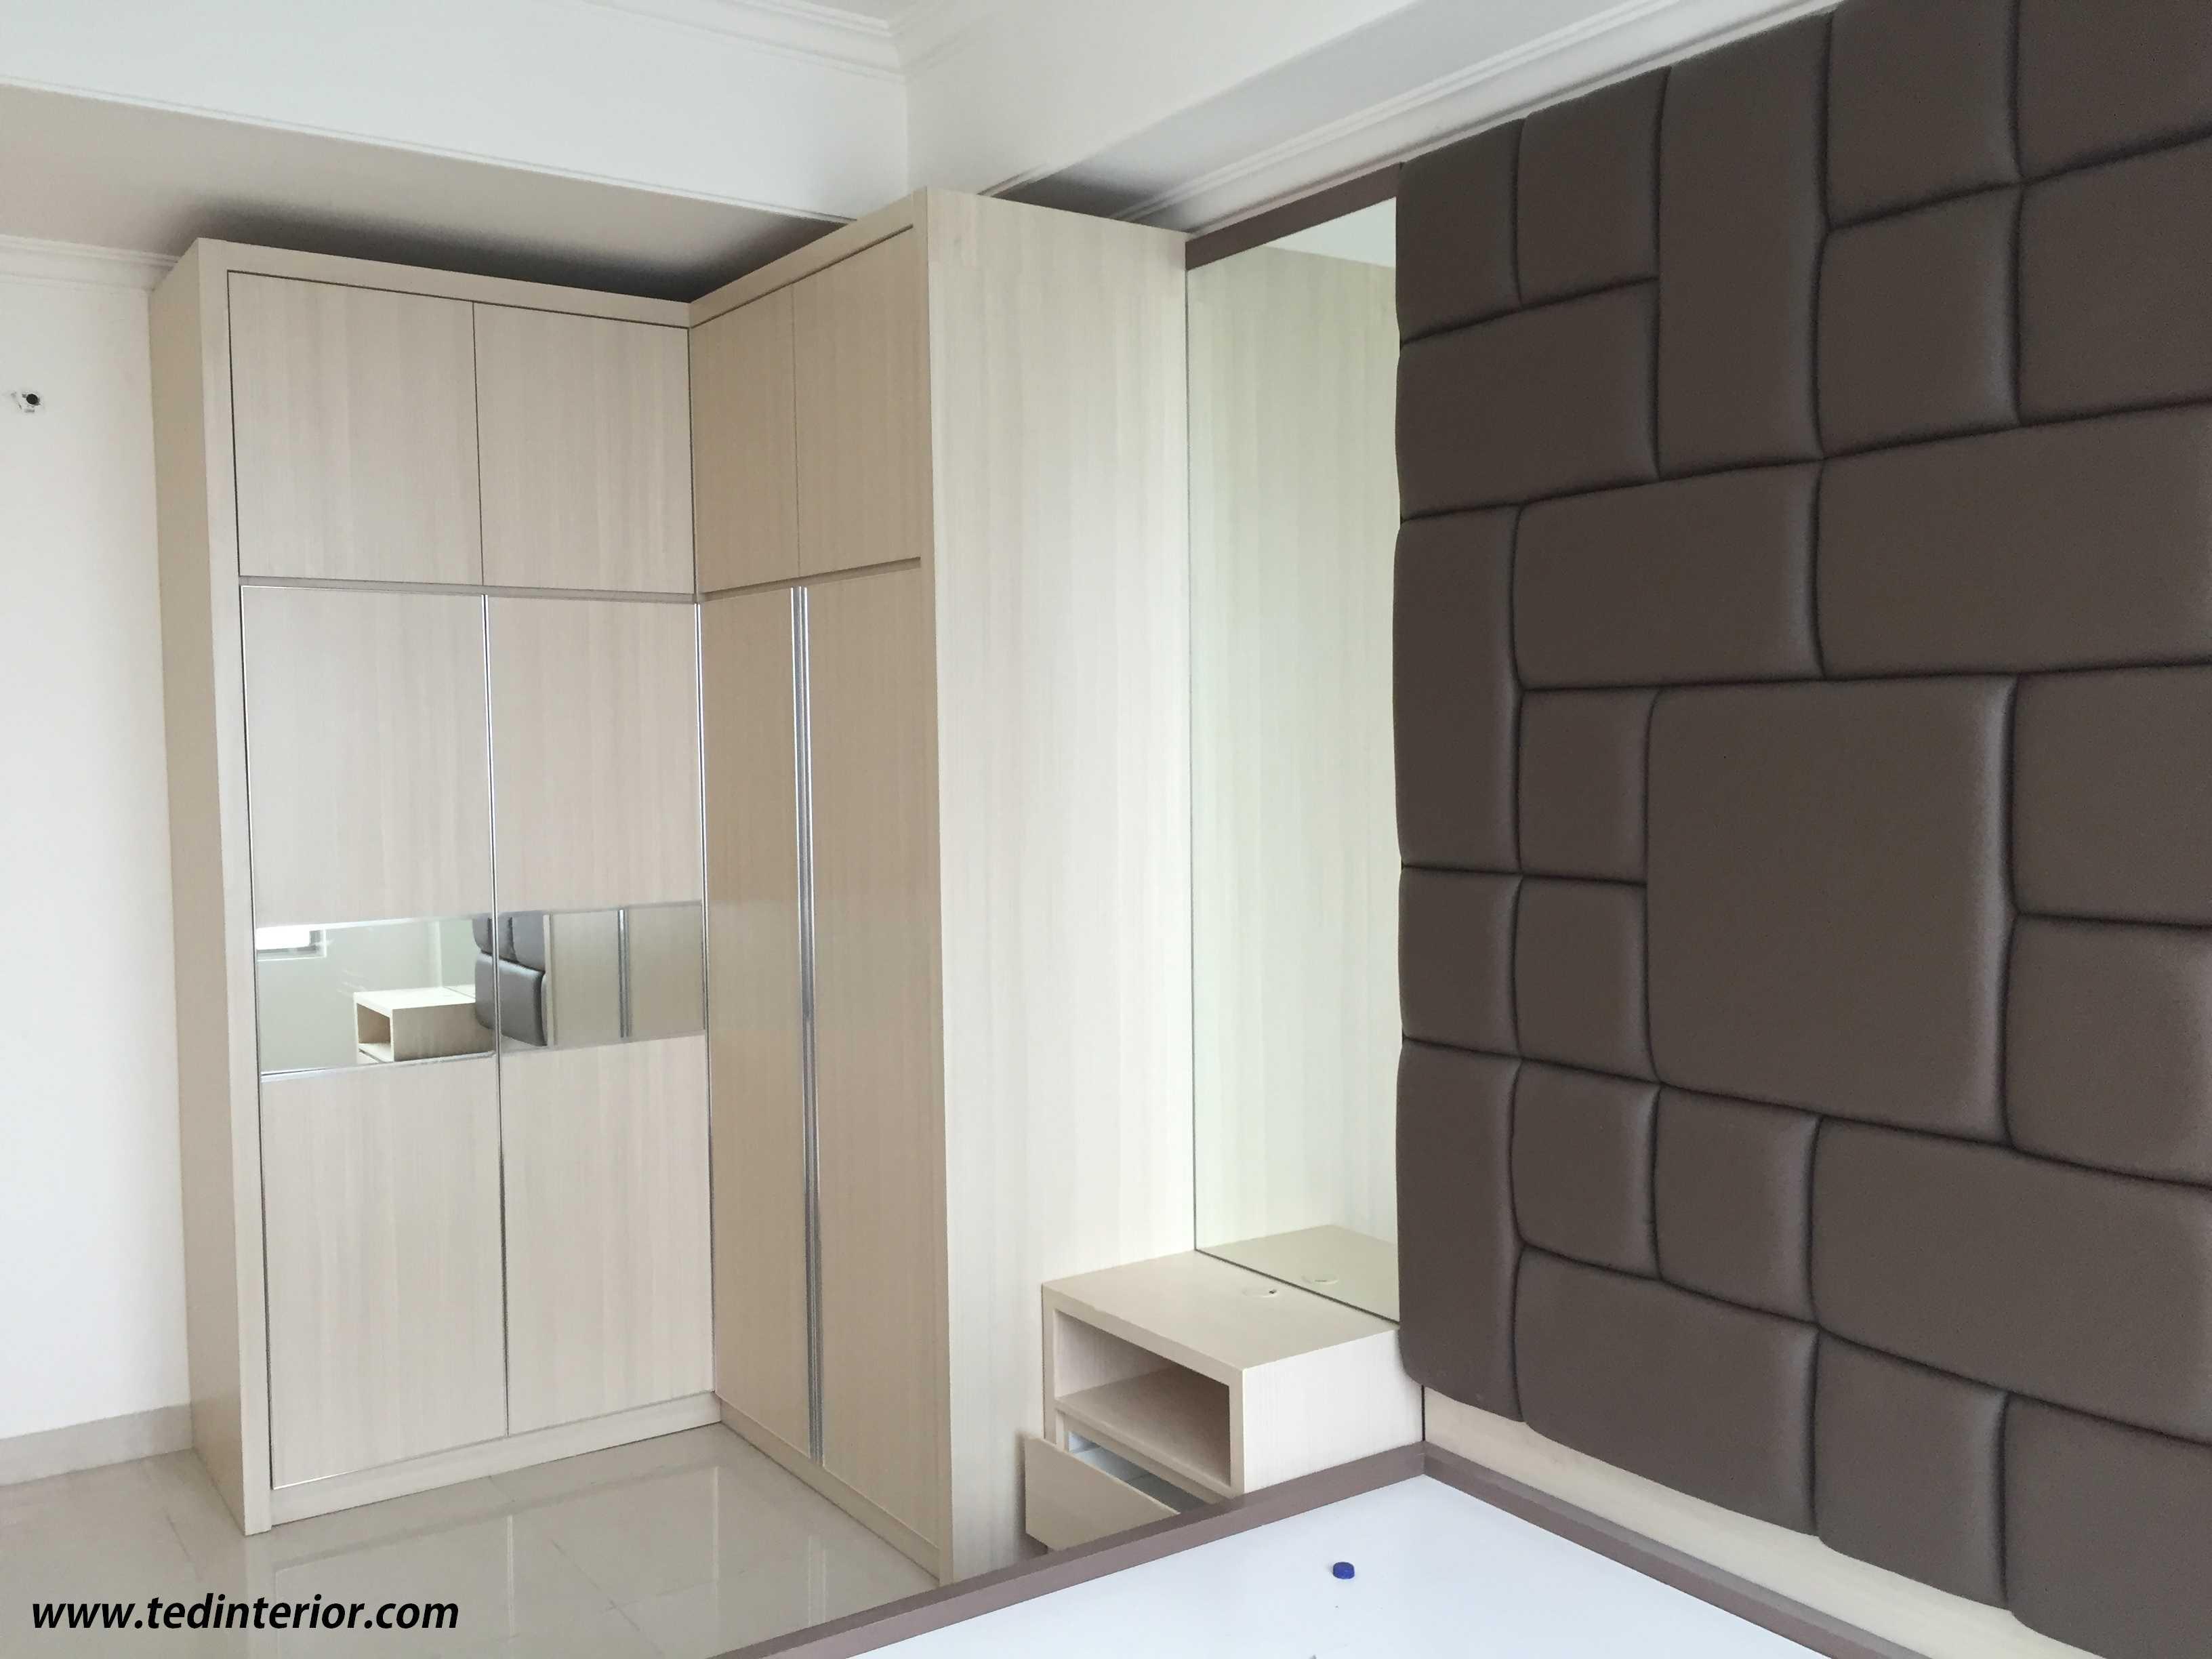 Pd Teguh Desain Indonesia Apartment Kuningan City Jakarta, Indonesia Jakarta, Indonesia Master-Bedroom-1 Modern  34861